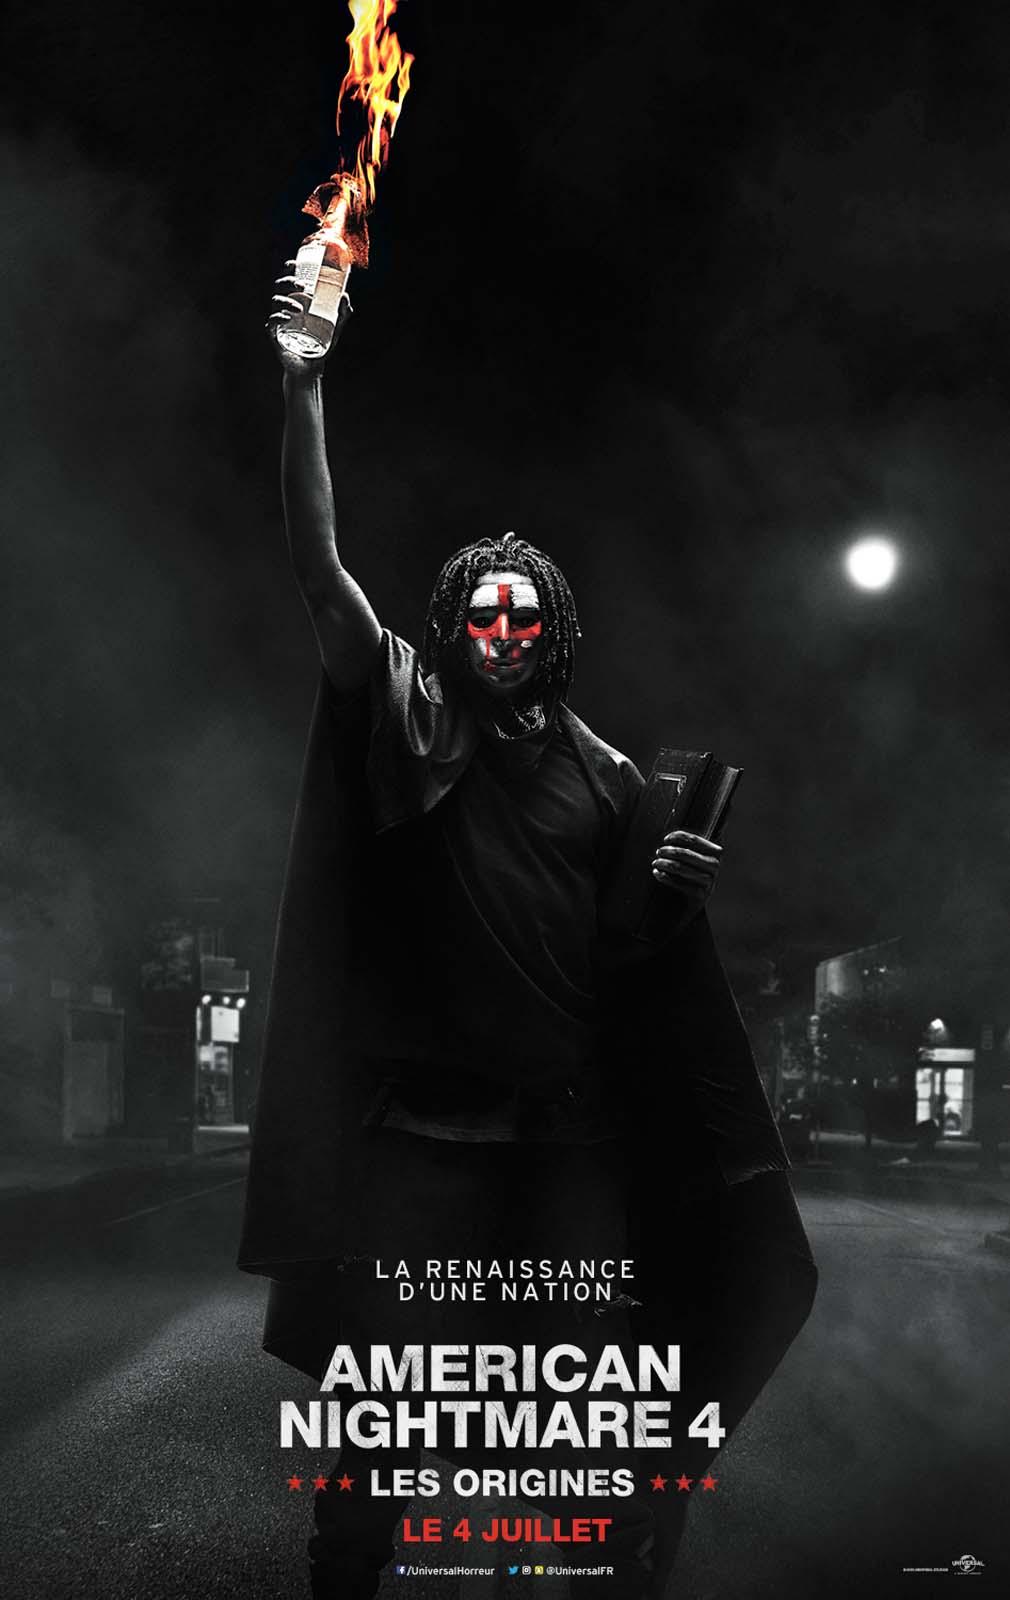 American Nightmare 4 - Les Origines affiche furyosa